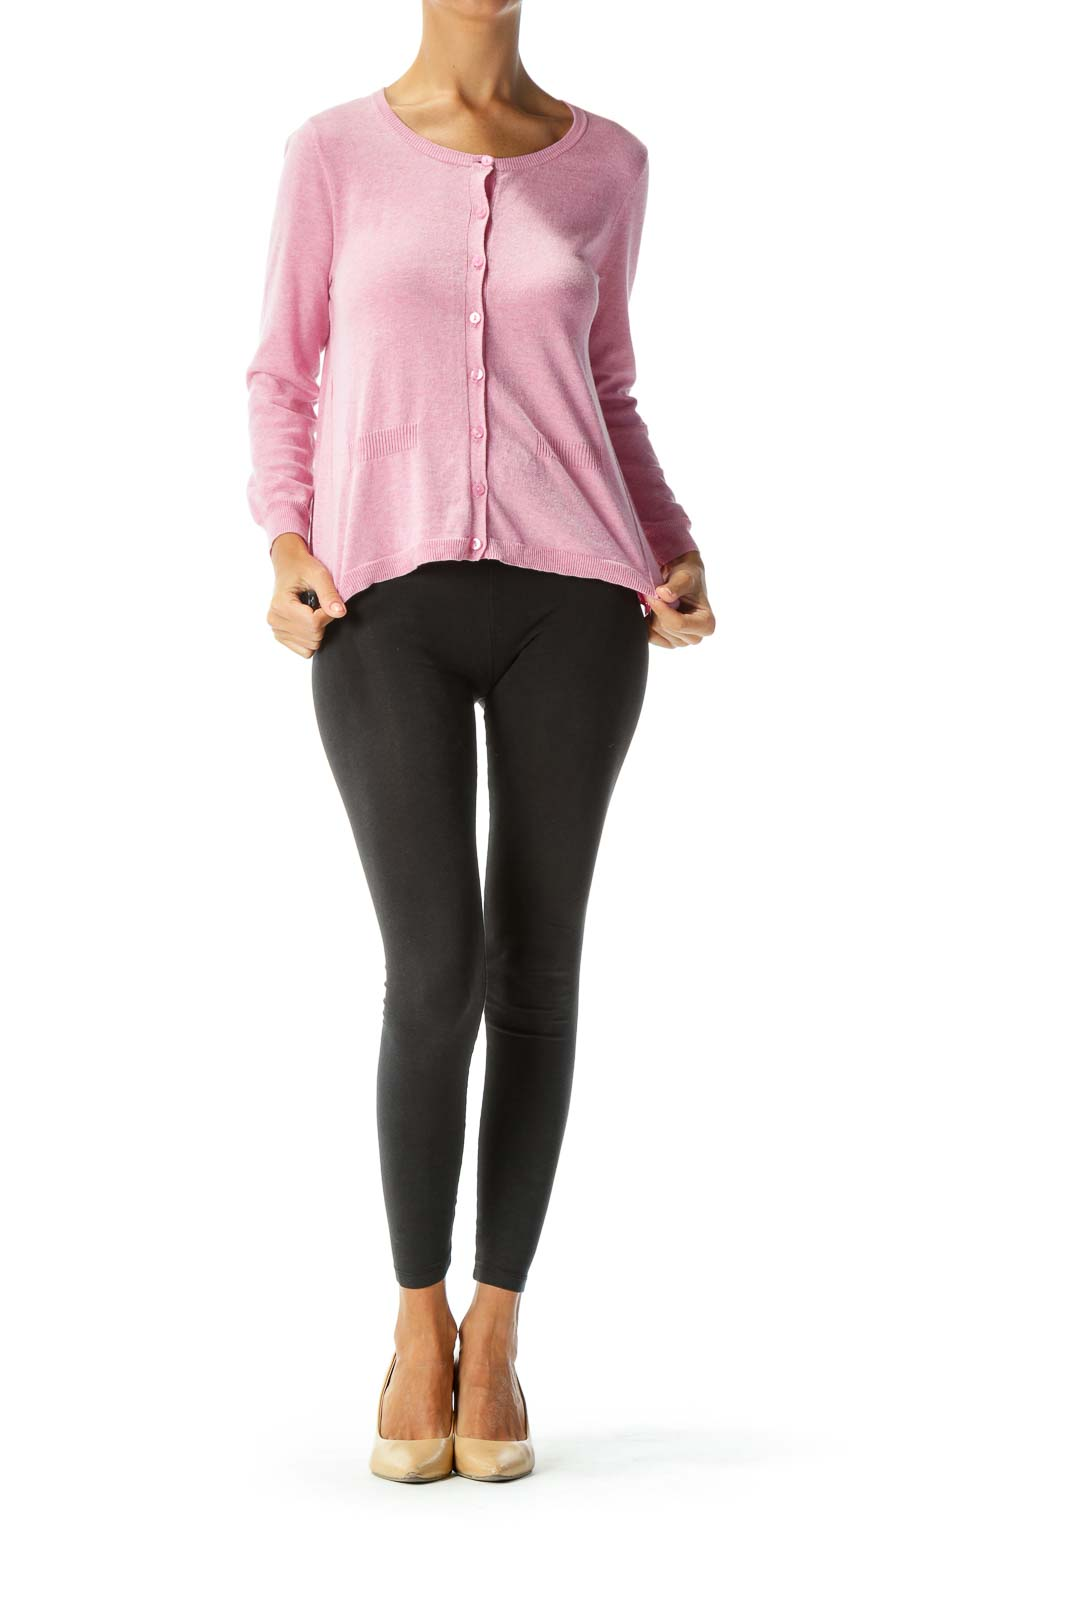 Pink Button-Down Light-Weight Cardigan